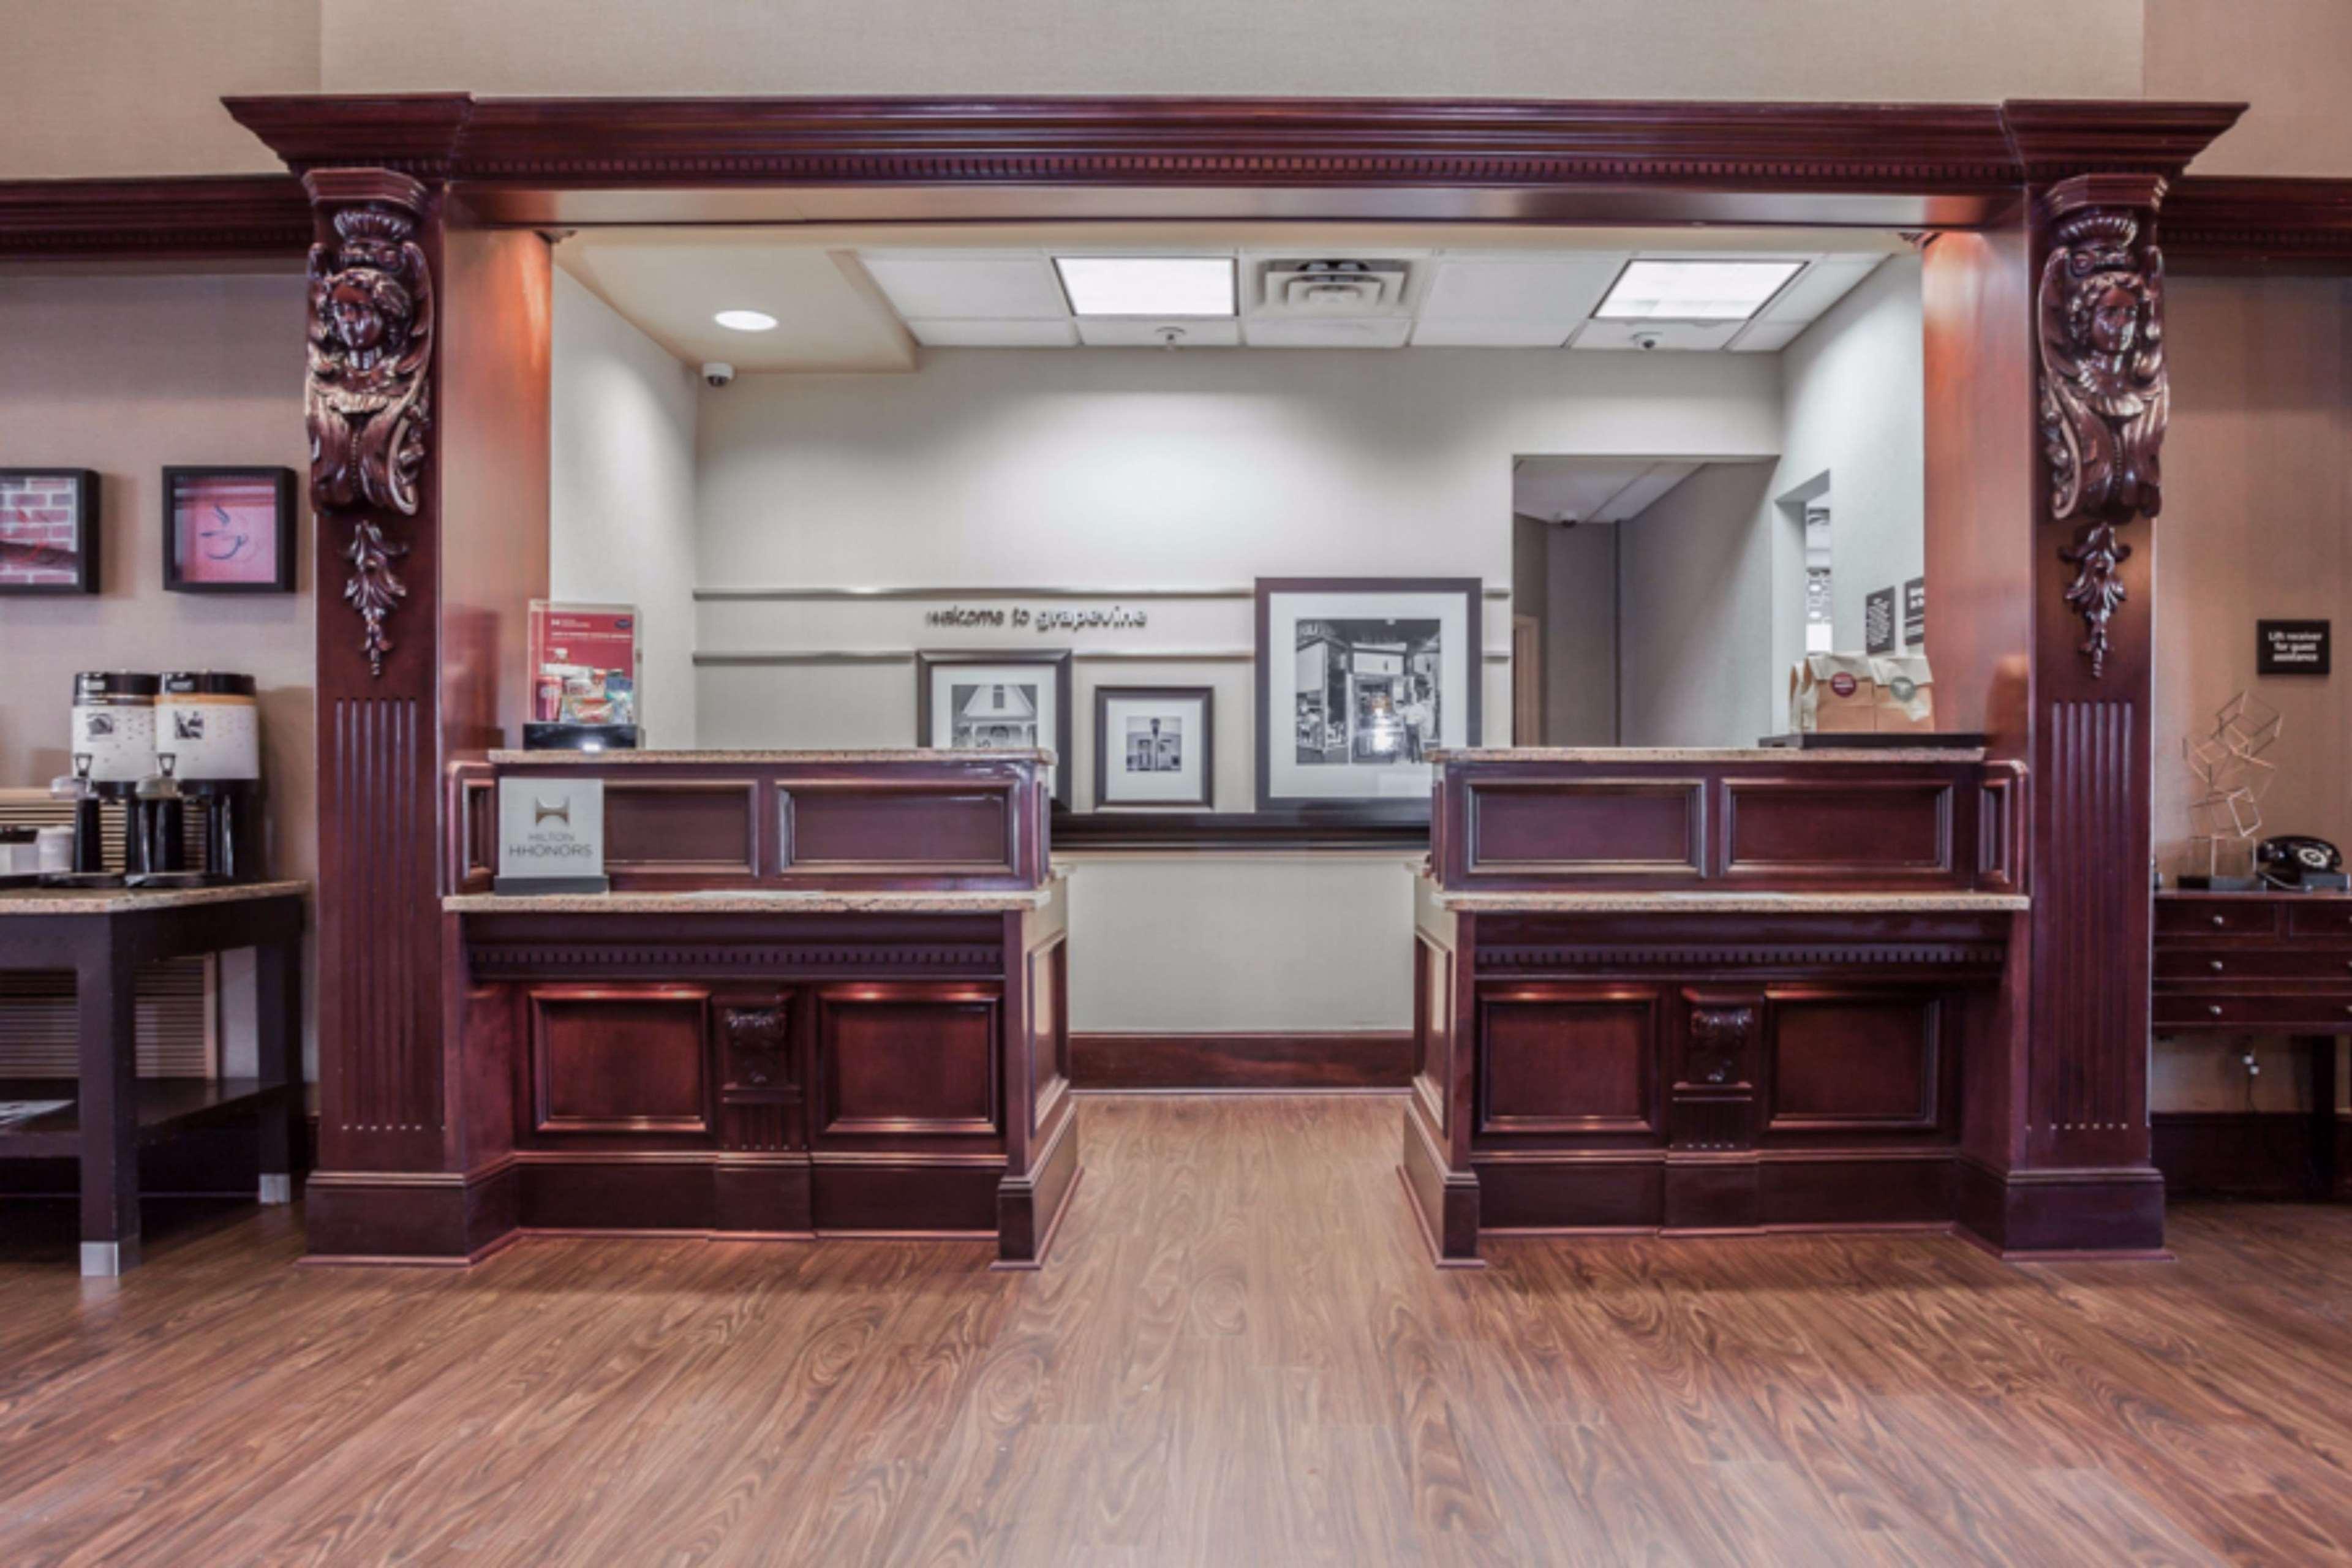 Hampton Inn & Suites Dallas-DFW Airport North-Grapevine image 3